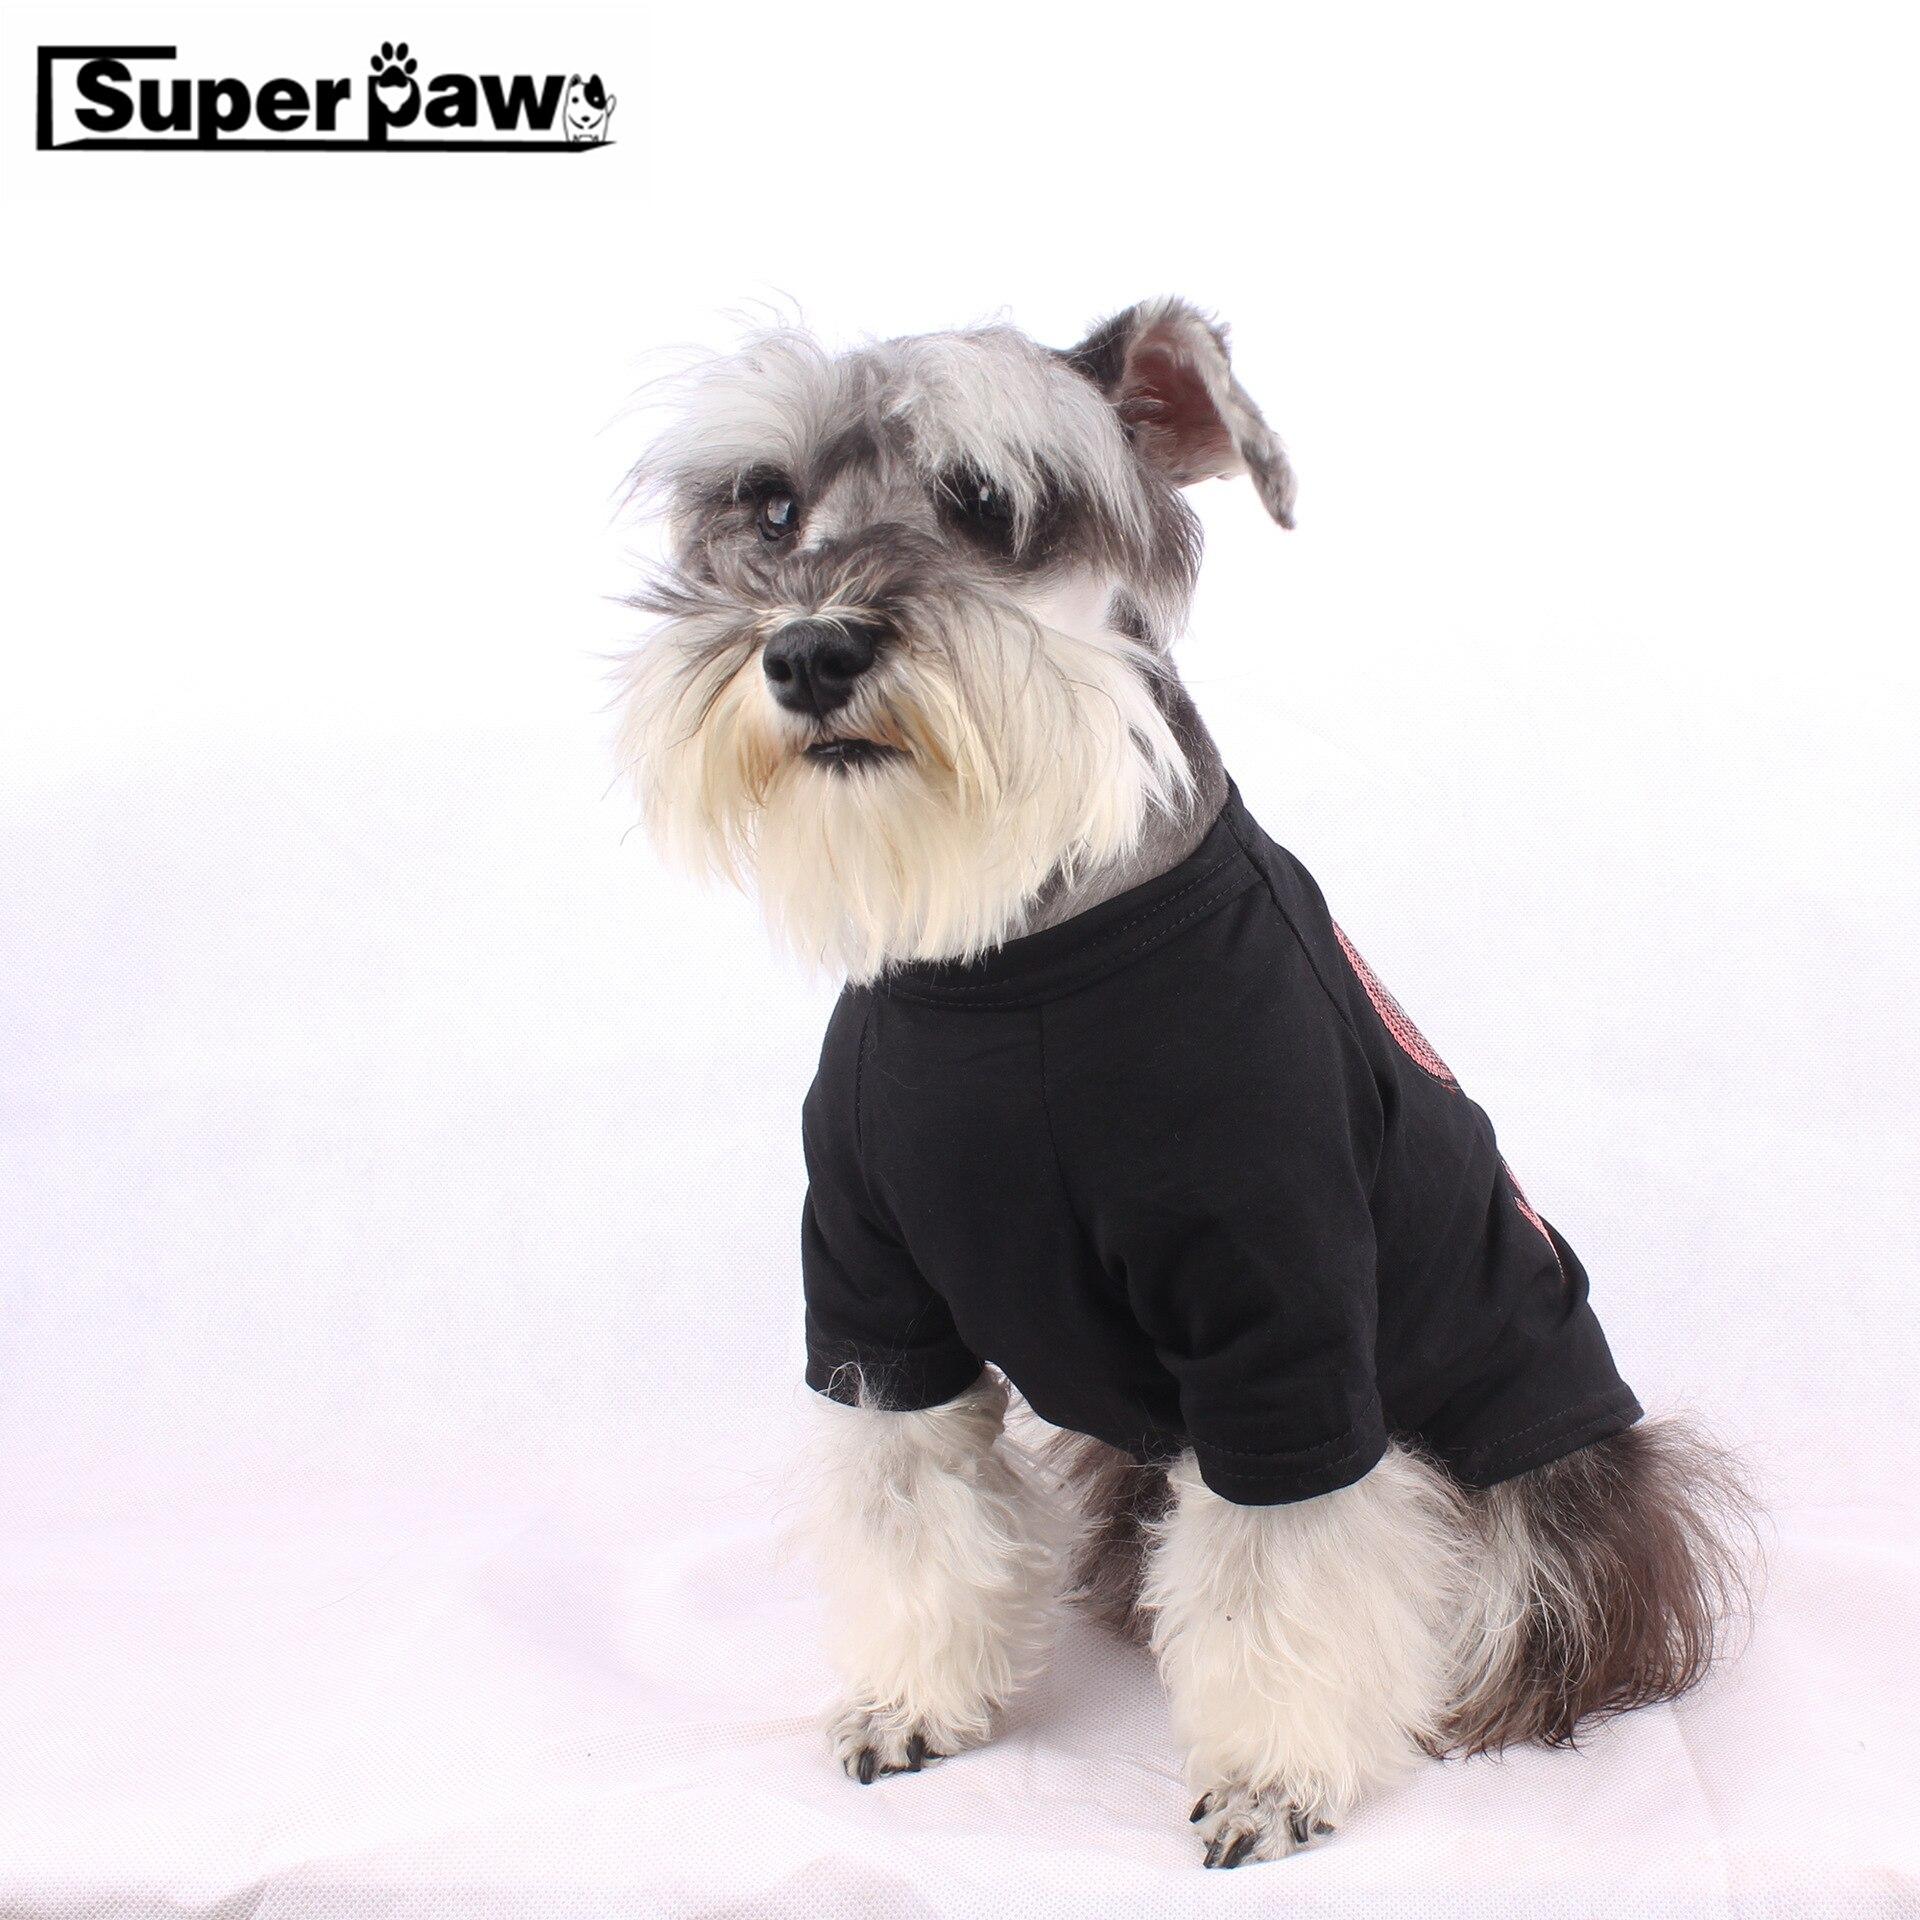 Fashion Pet Summer T-shirt Vest Cat Dog Clothes Cats Dogs Pets Clothing Apparel Schnauzer French Bulldog Chihuahua Costume GKC05